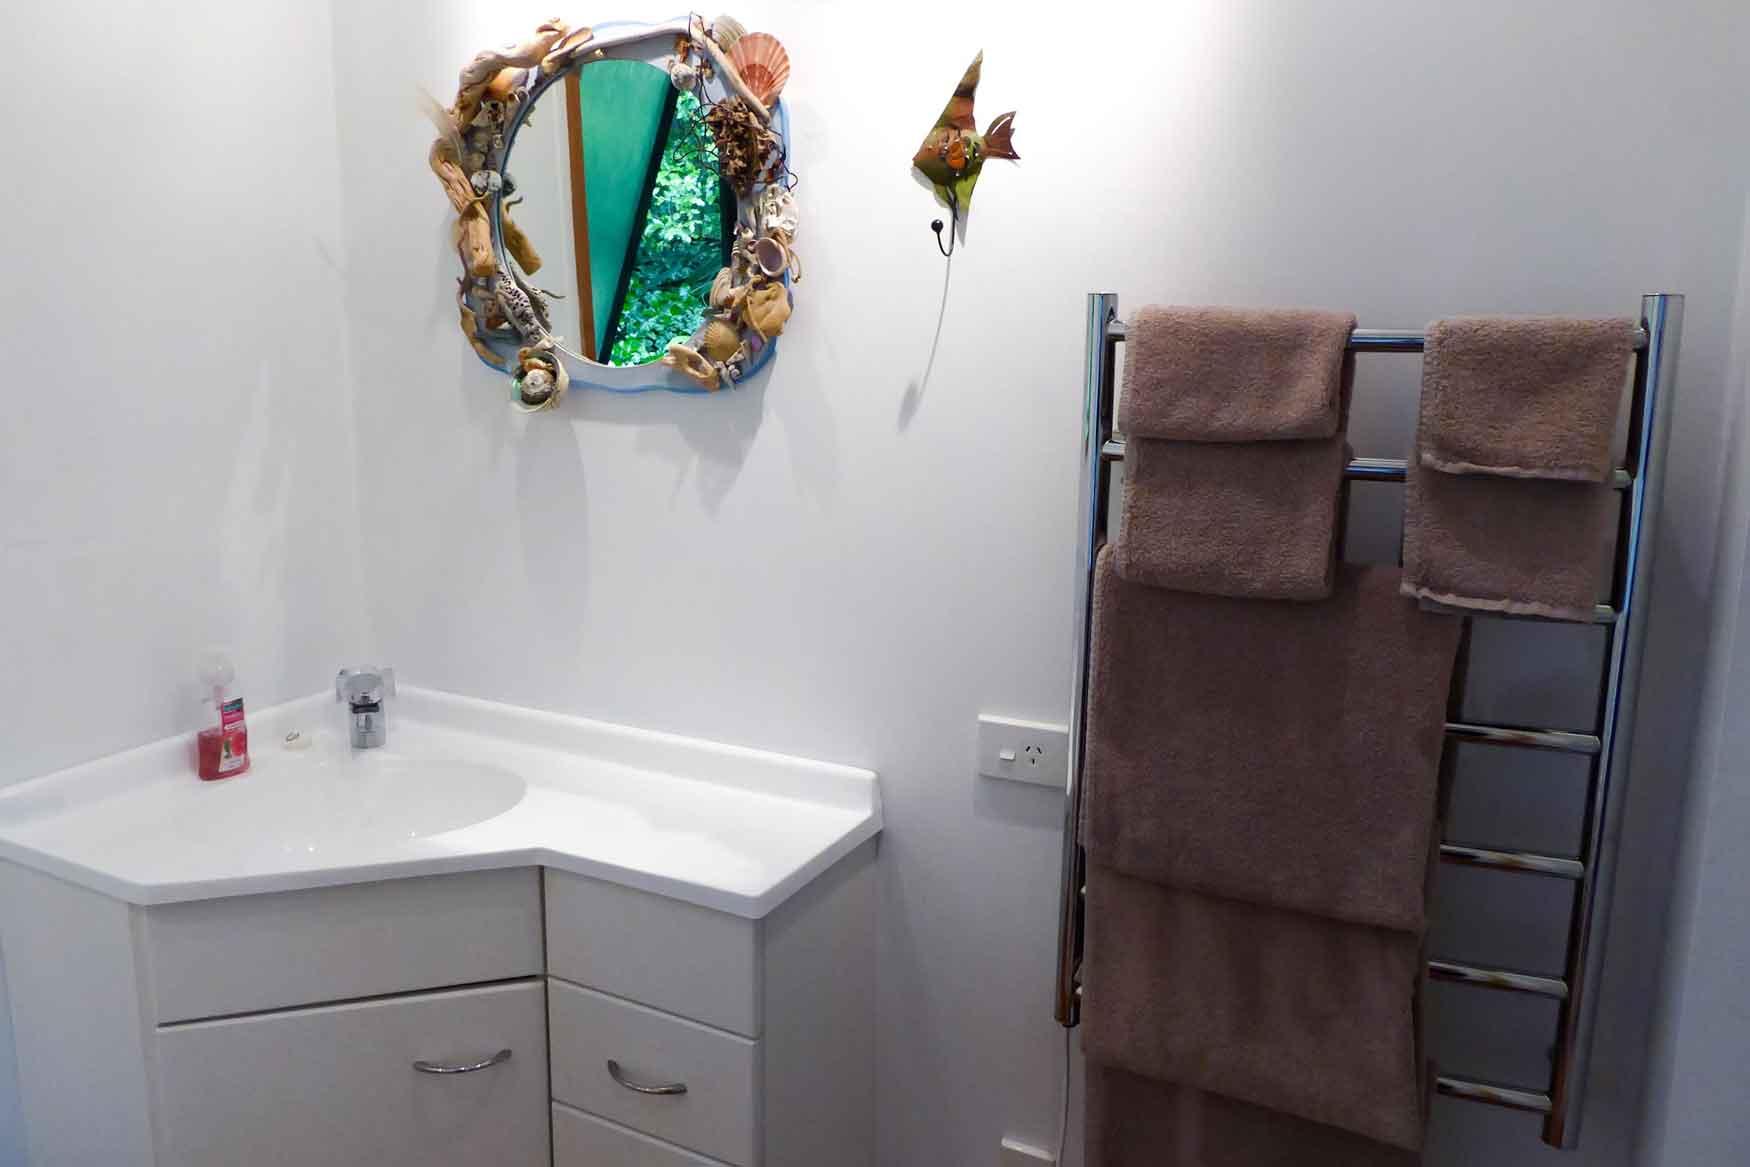 Bathroom of Bellbird cottage accommodation in Dunedin